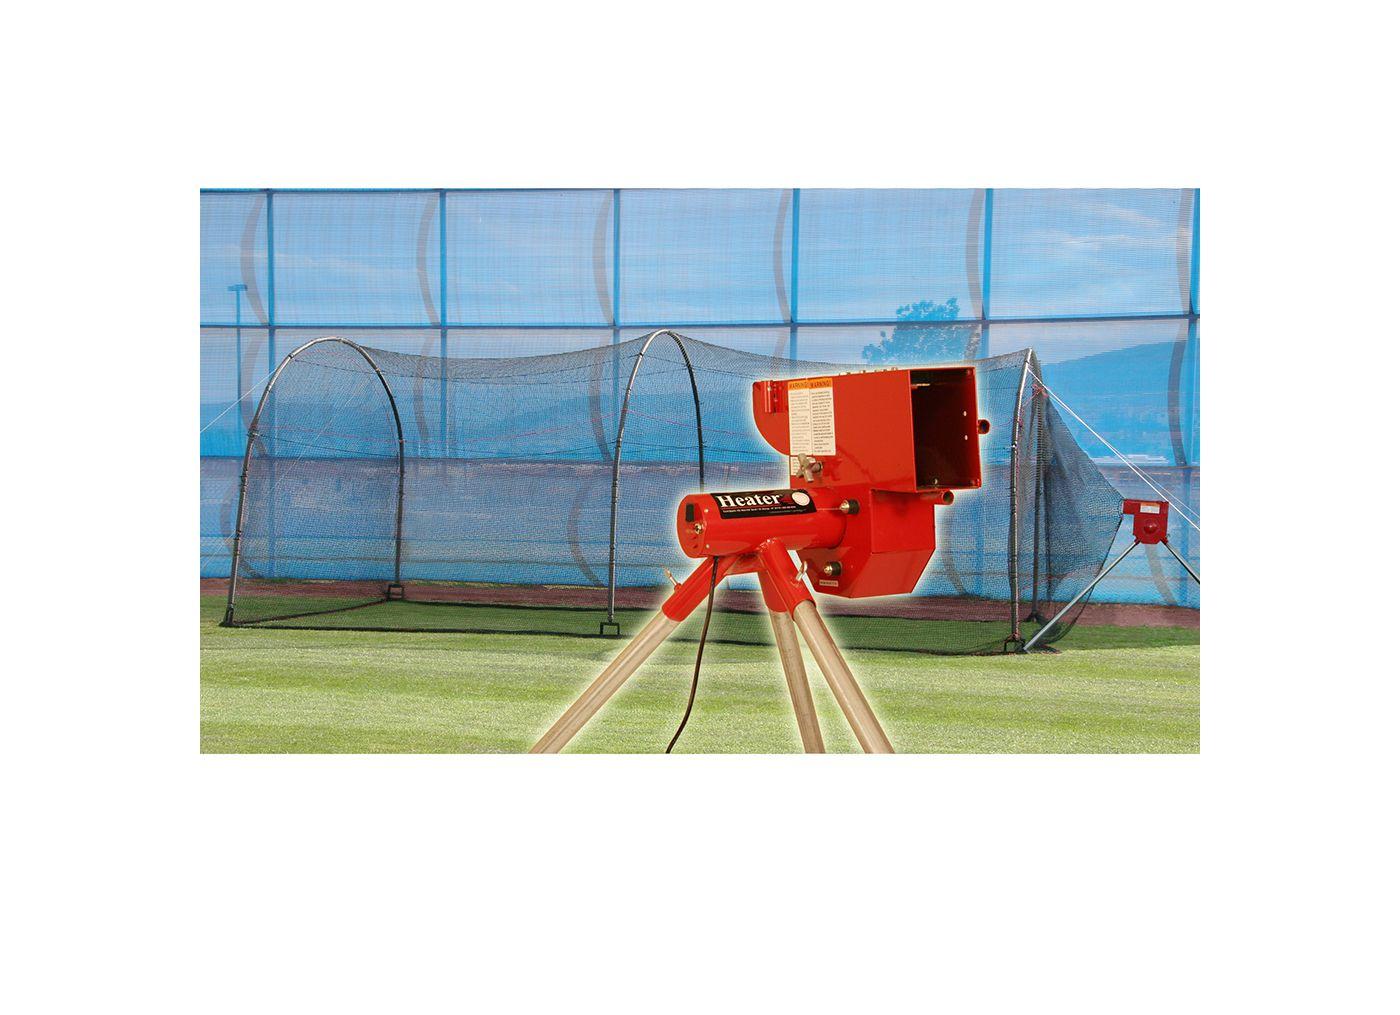 "Heater 12"" Softball Pitching Machine & Xtender 24' Batting Cage"